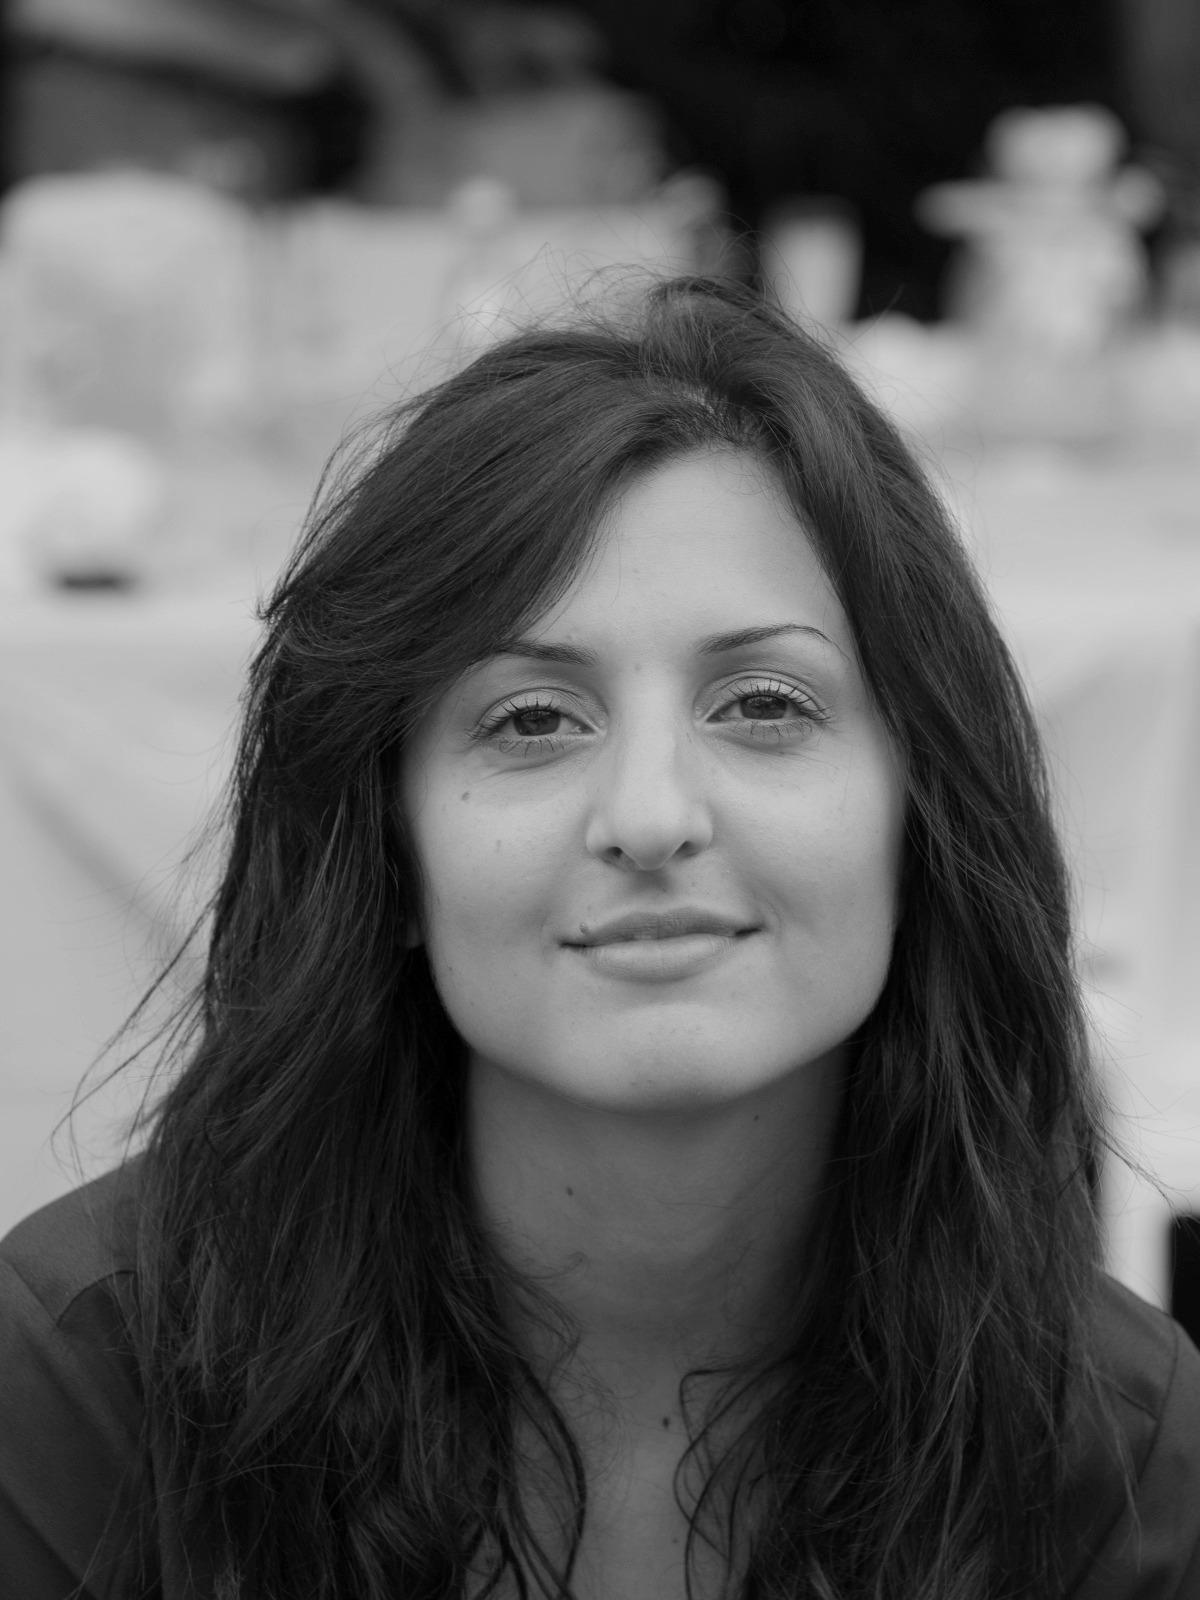 Isabella Sanfilippo